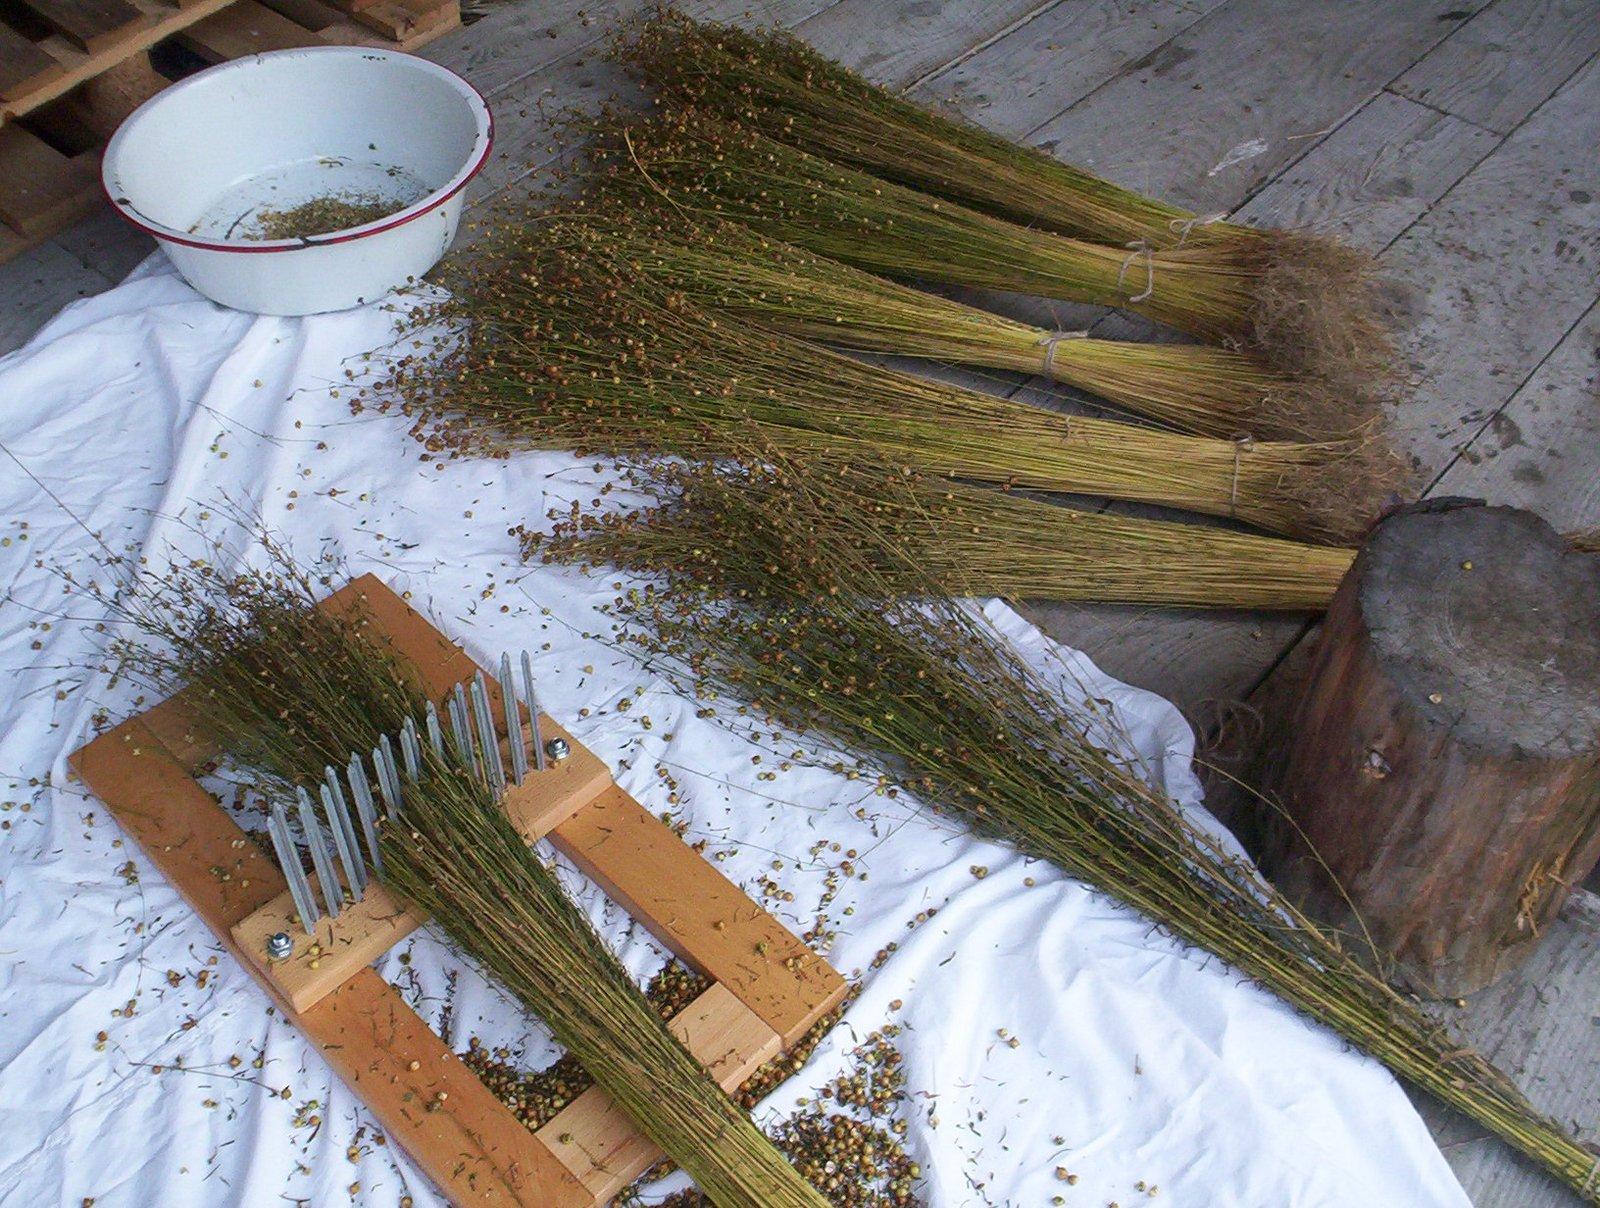 Processing flax. Photo courtesy of Vävstuga Weaving School.